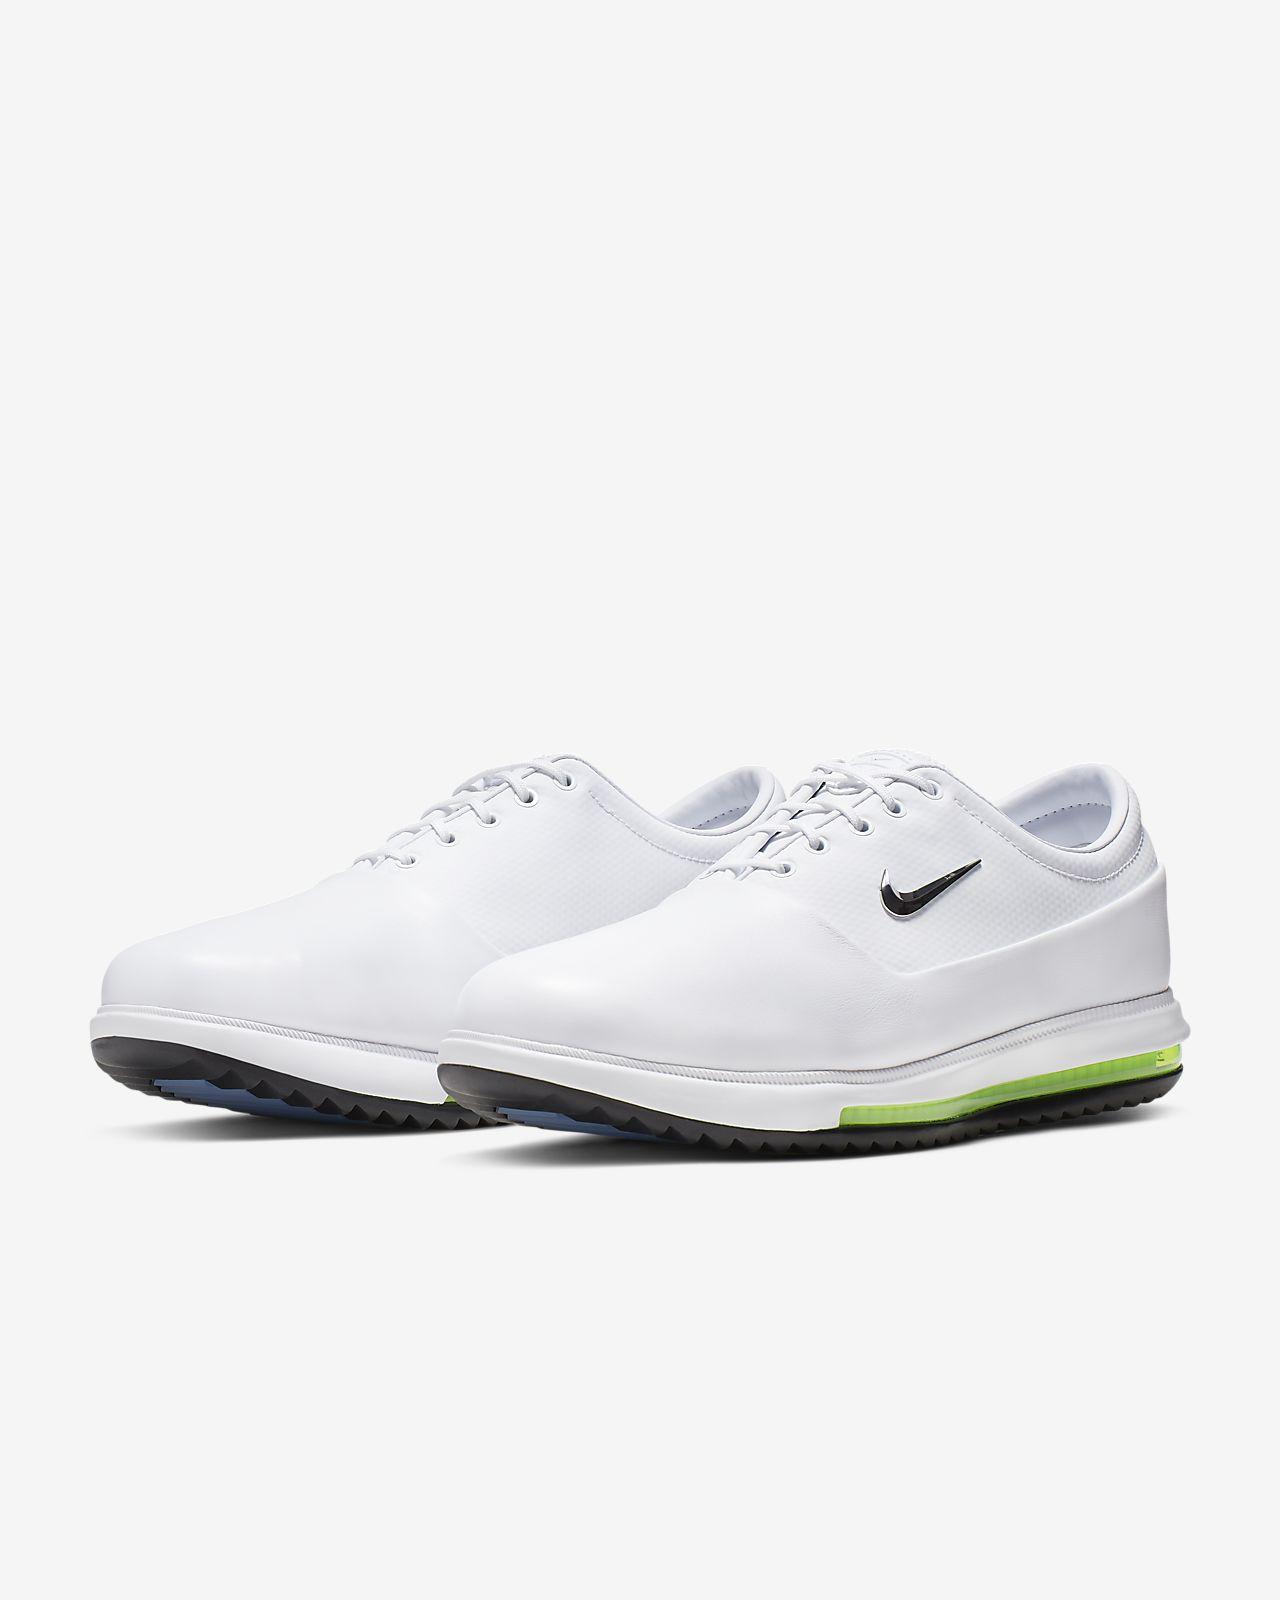 6fa4e6b6 Nike Air Zoom Victory Tour On/Off Course Men's Golf Shoe. Nike.com